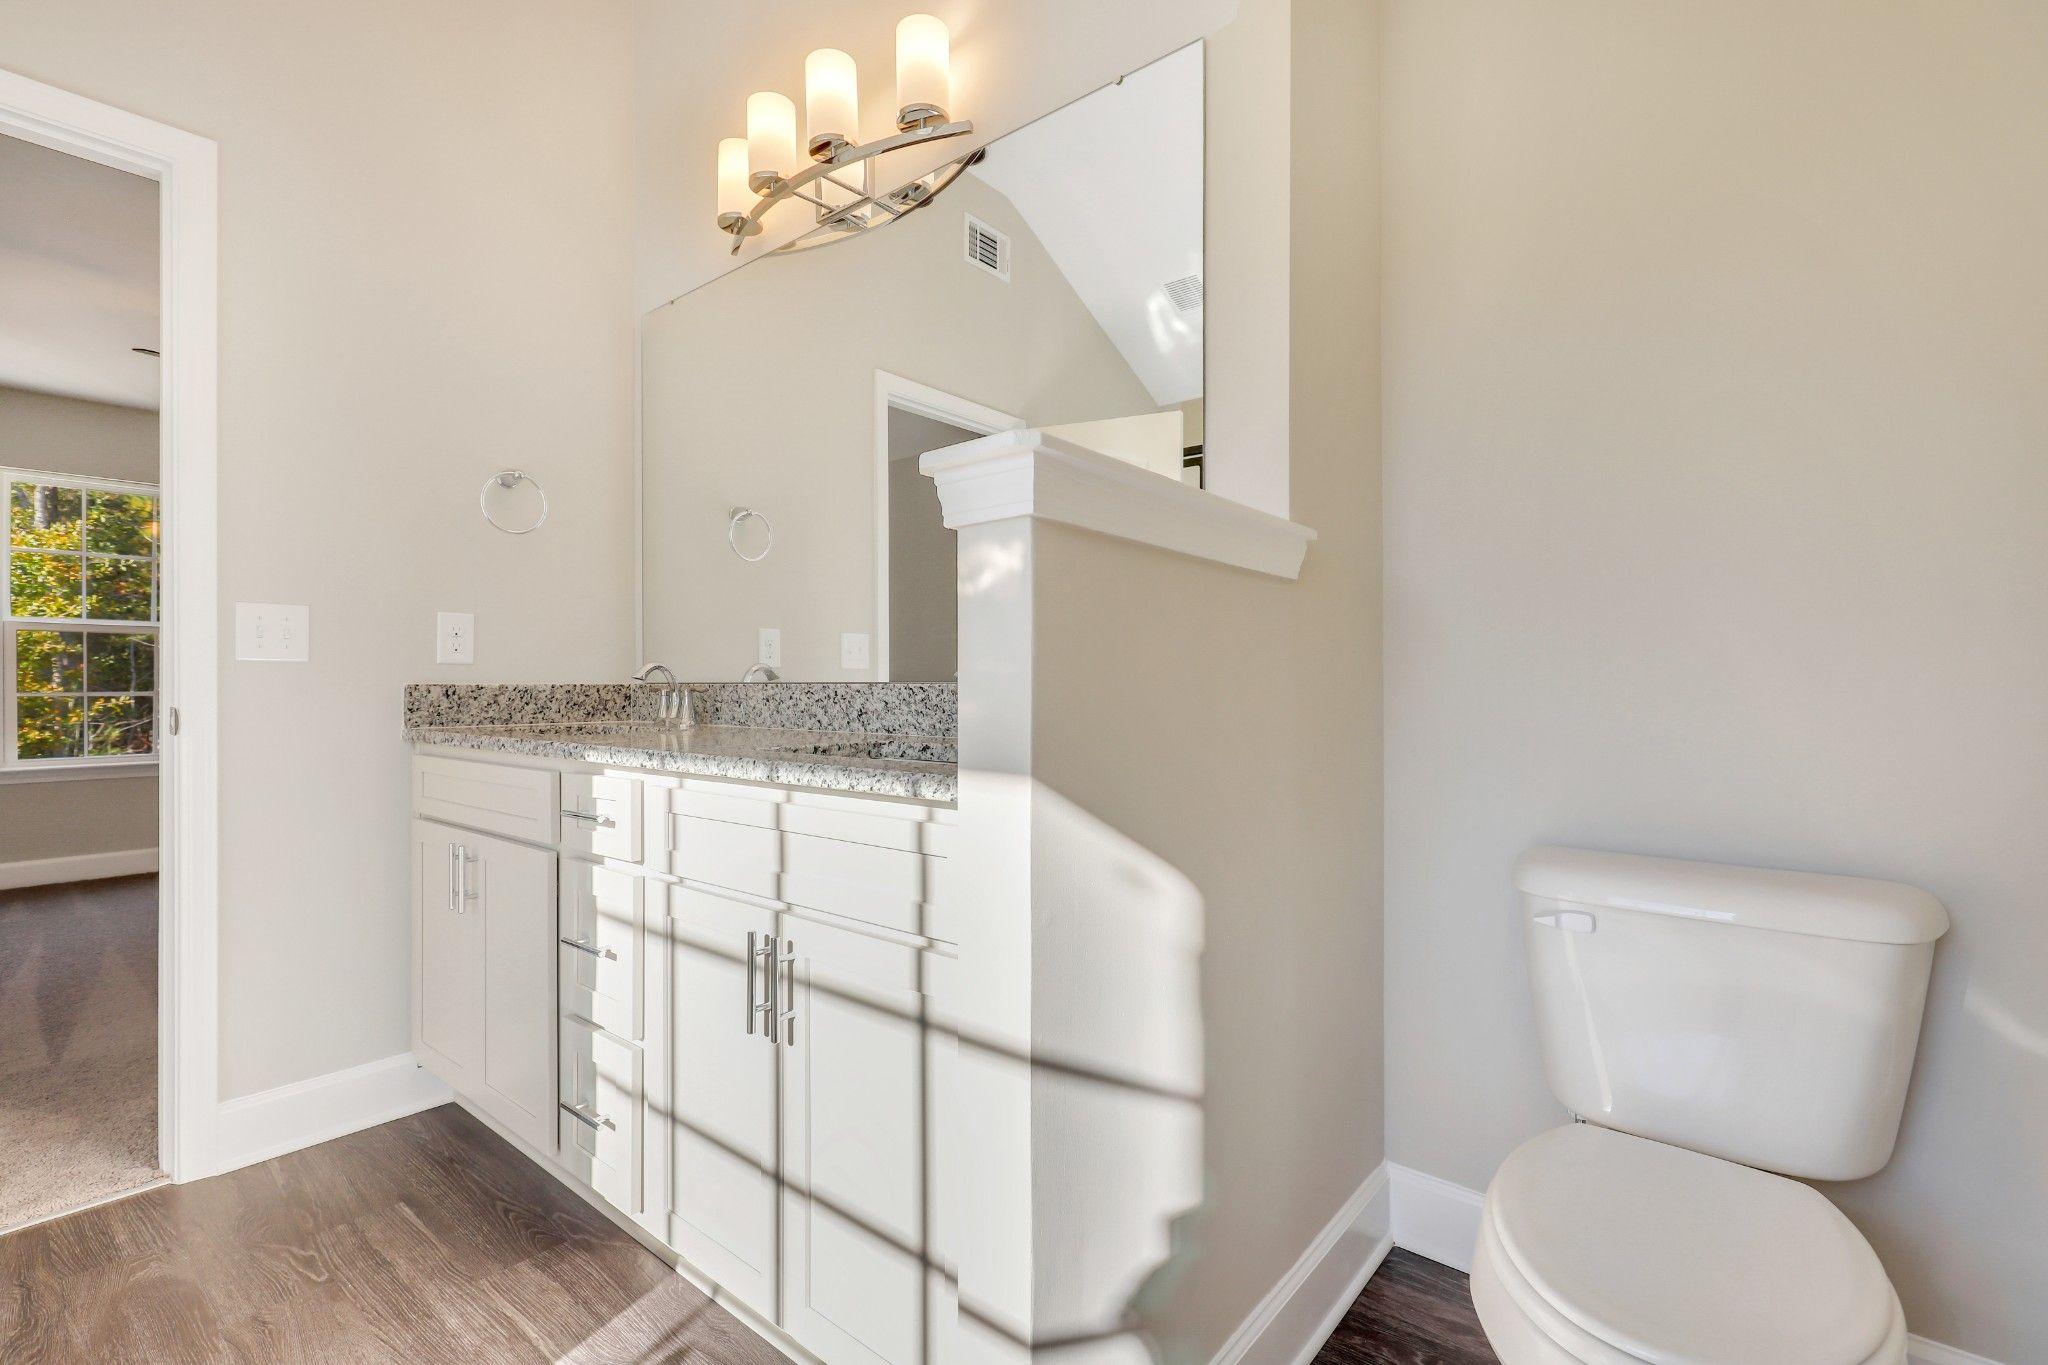 Bathroom featured in the Kiawah By Ernest Homes in Savannah, GA